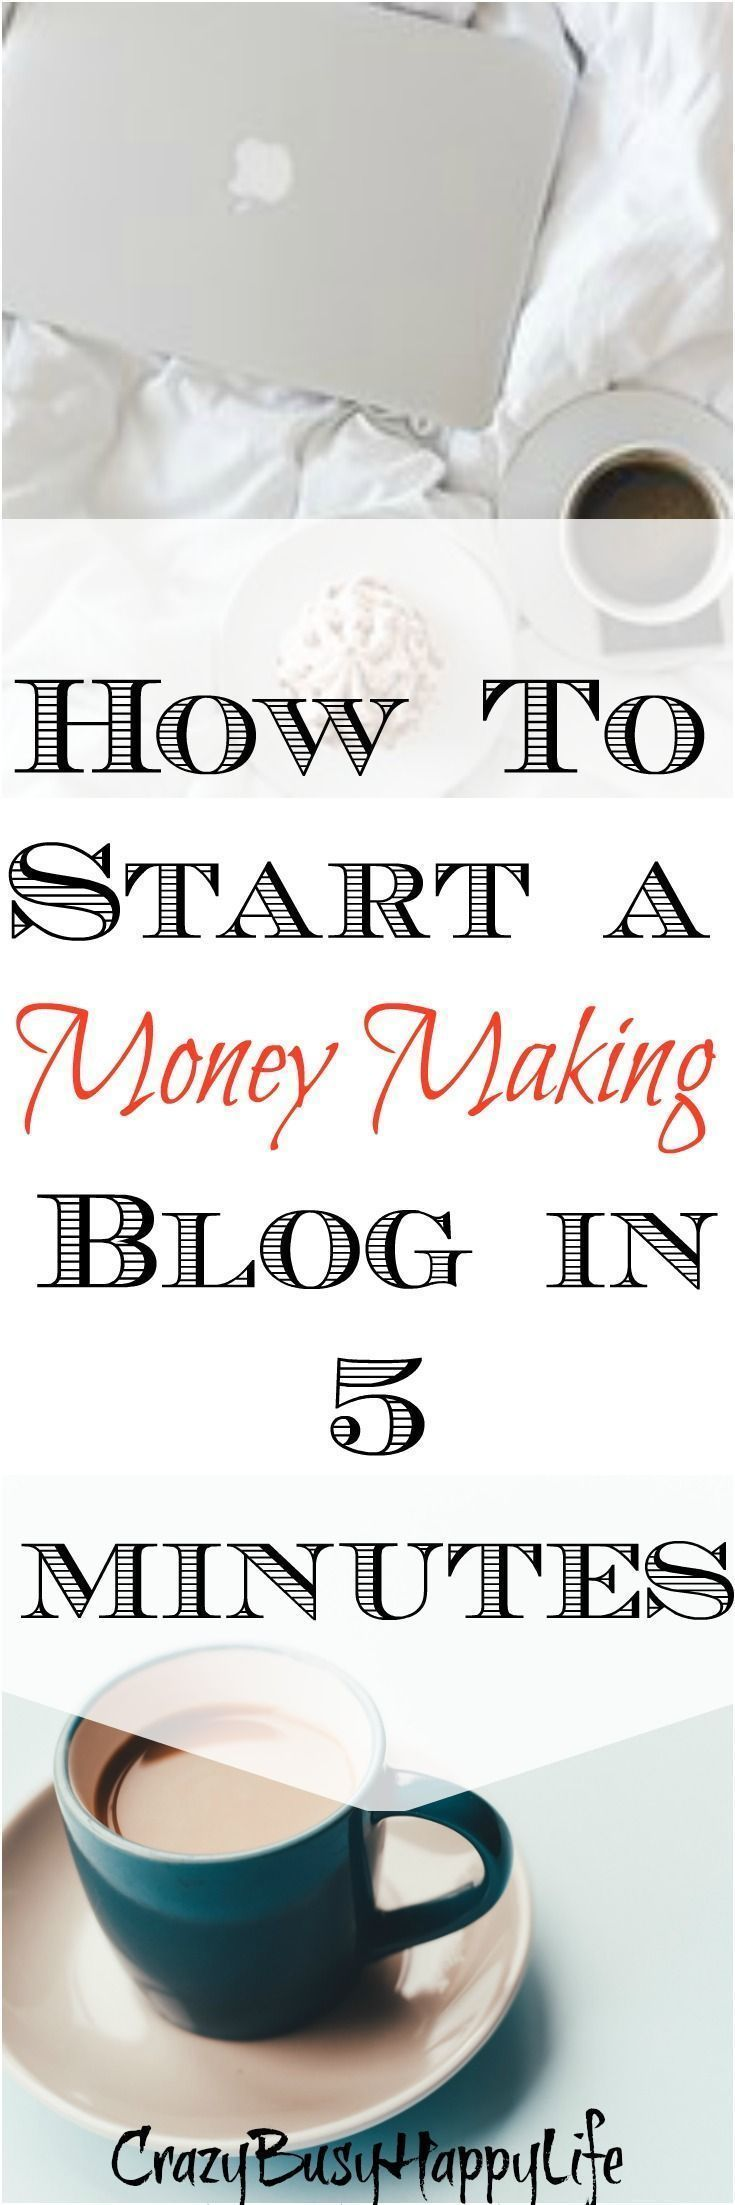 63 best Blog images on Pinterest | Blog tips, Business tips and ...